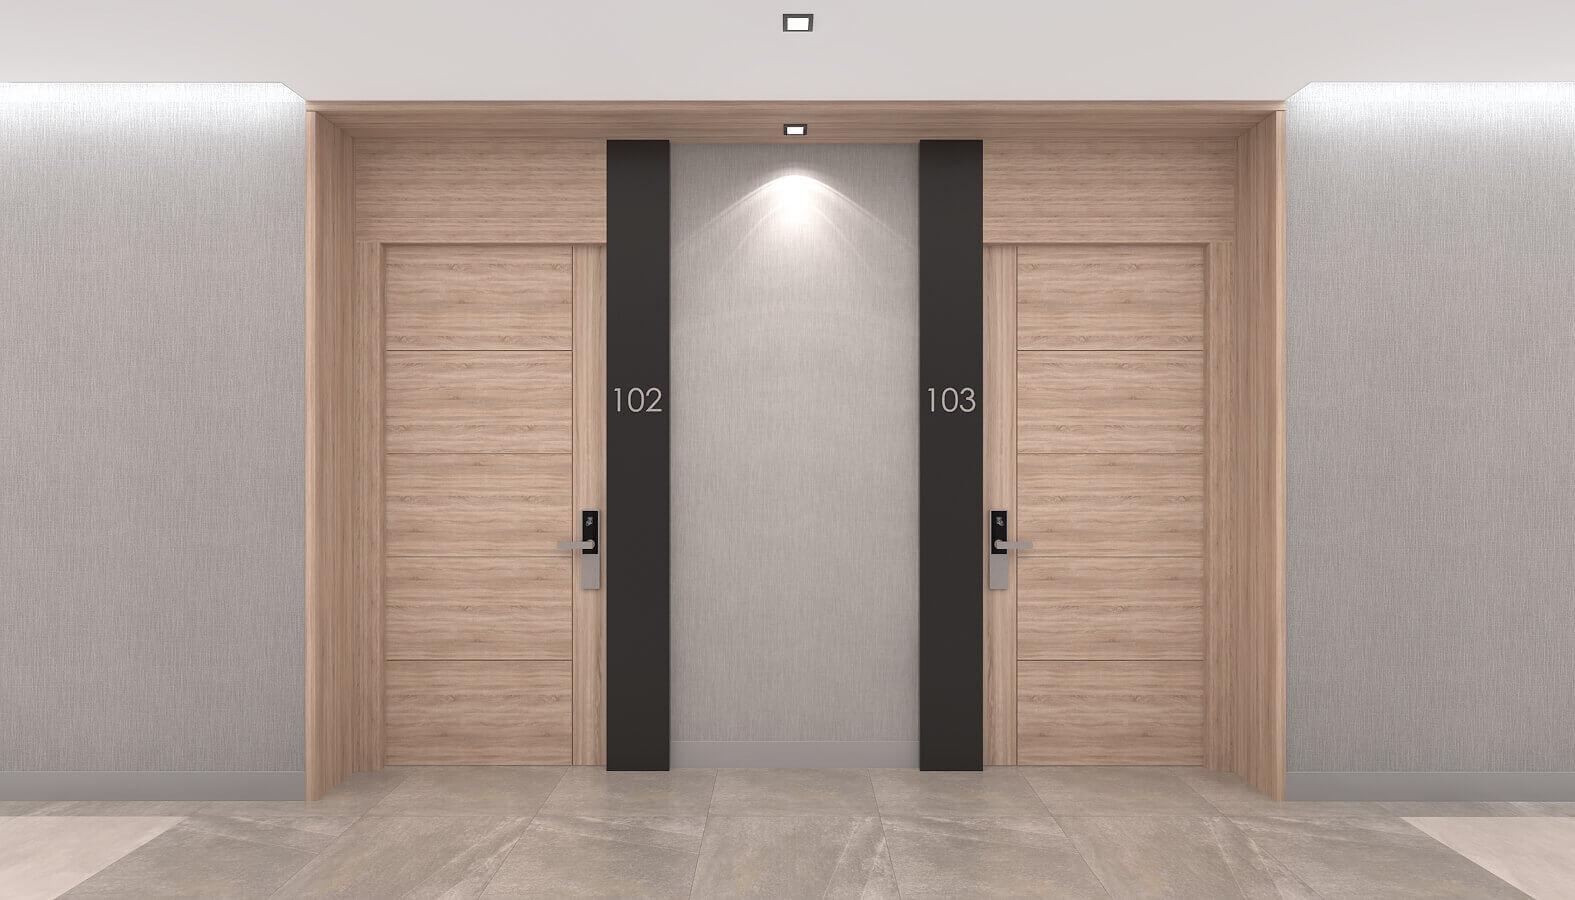 Lobby design 3600 Dogruer hotel Hotels